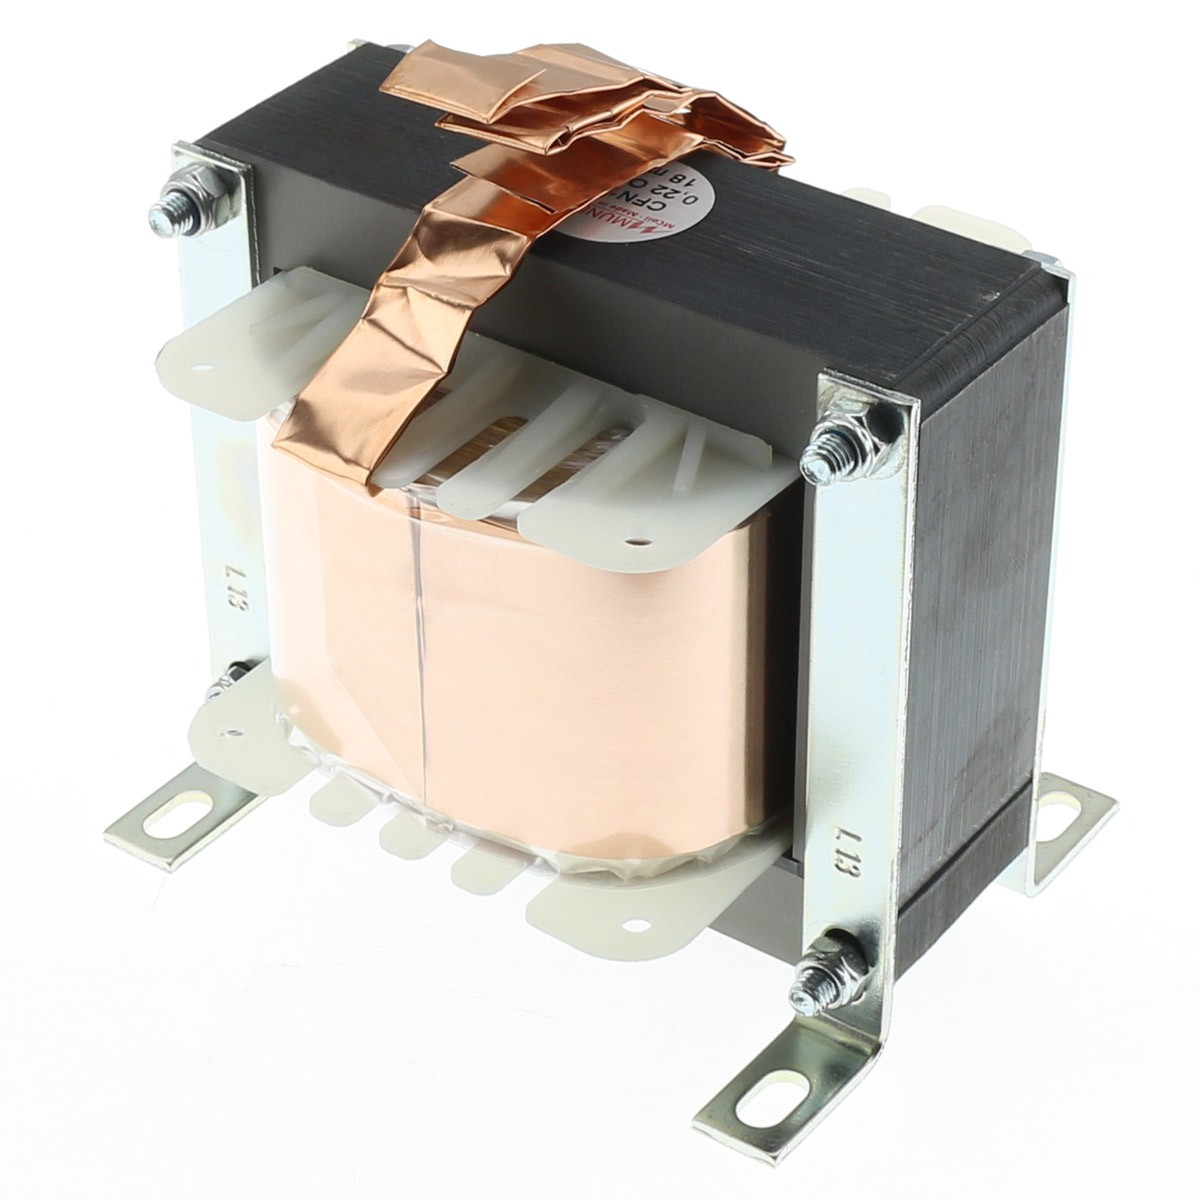 MUNDORF CFN14 FOIL COIL Bobine Cuivre Zero-Ohm Noyau Feron 6.8mH